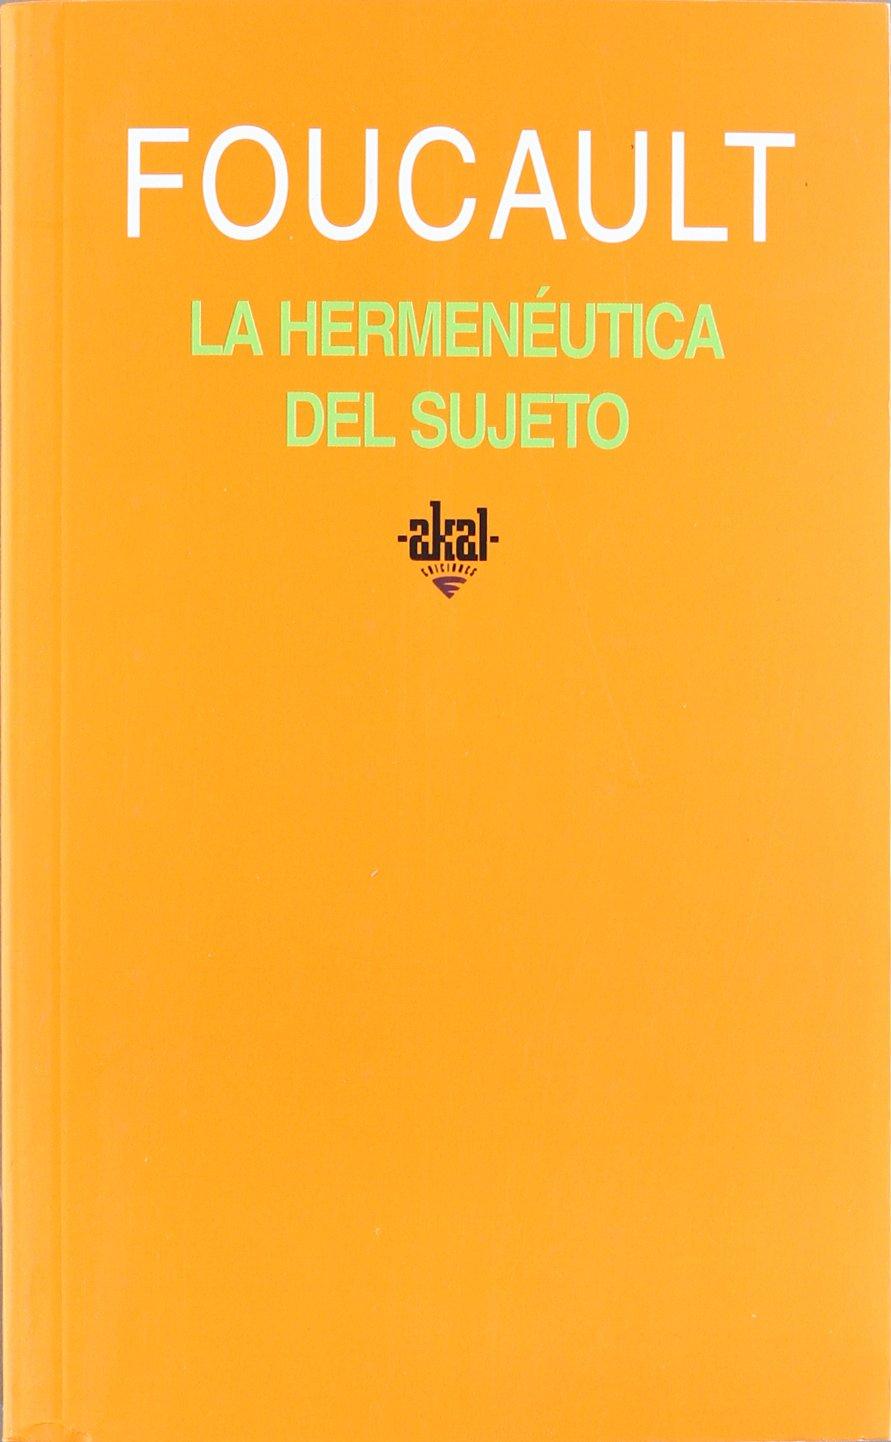 La hermenéutica del sujeto (Universitaria): Amazon.es: Michel Foucault: Libros